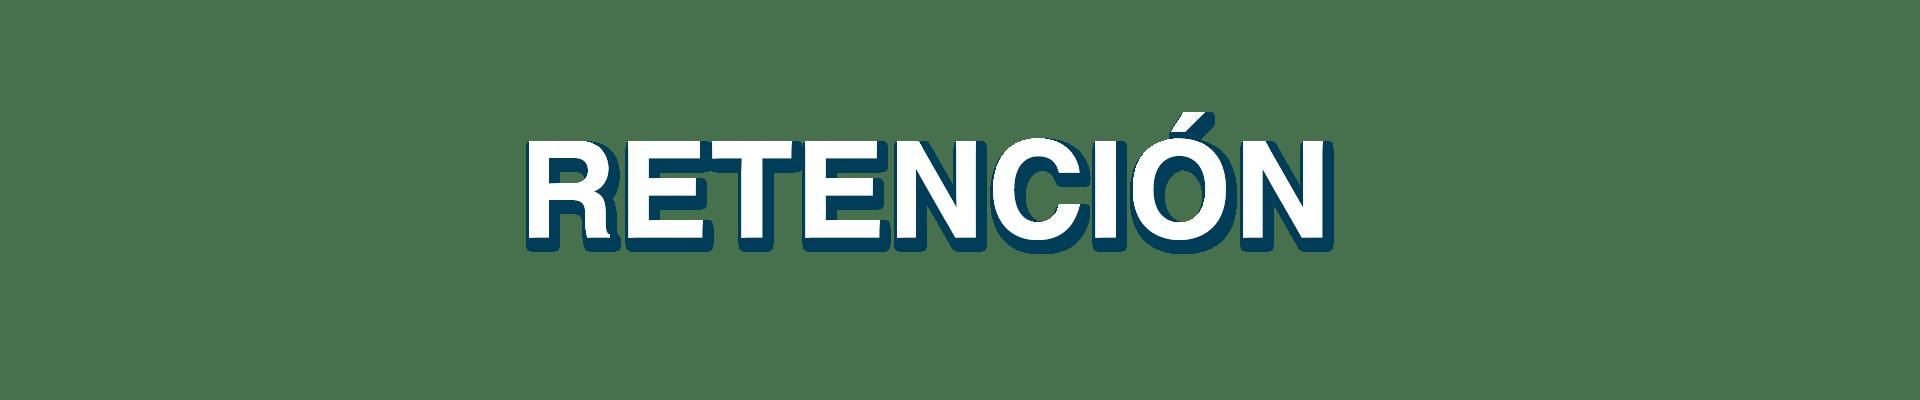 Aparatologia Ortodoncia Retencion